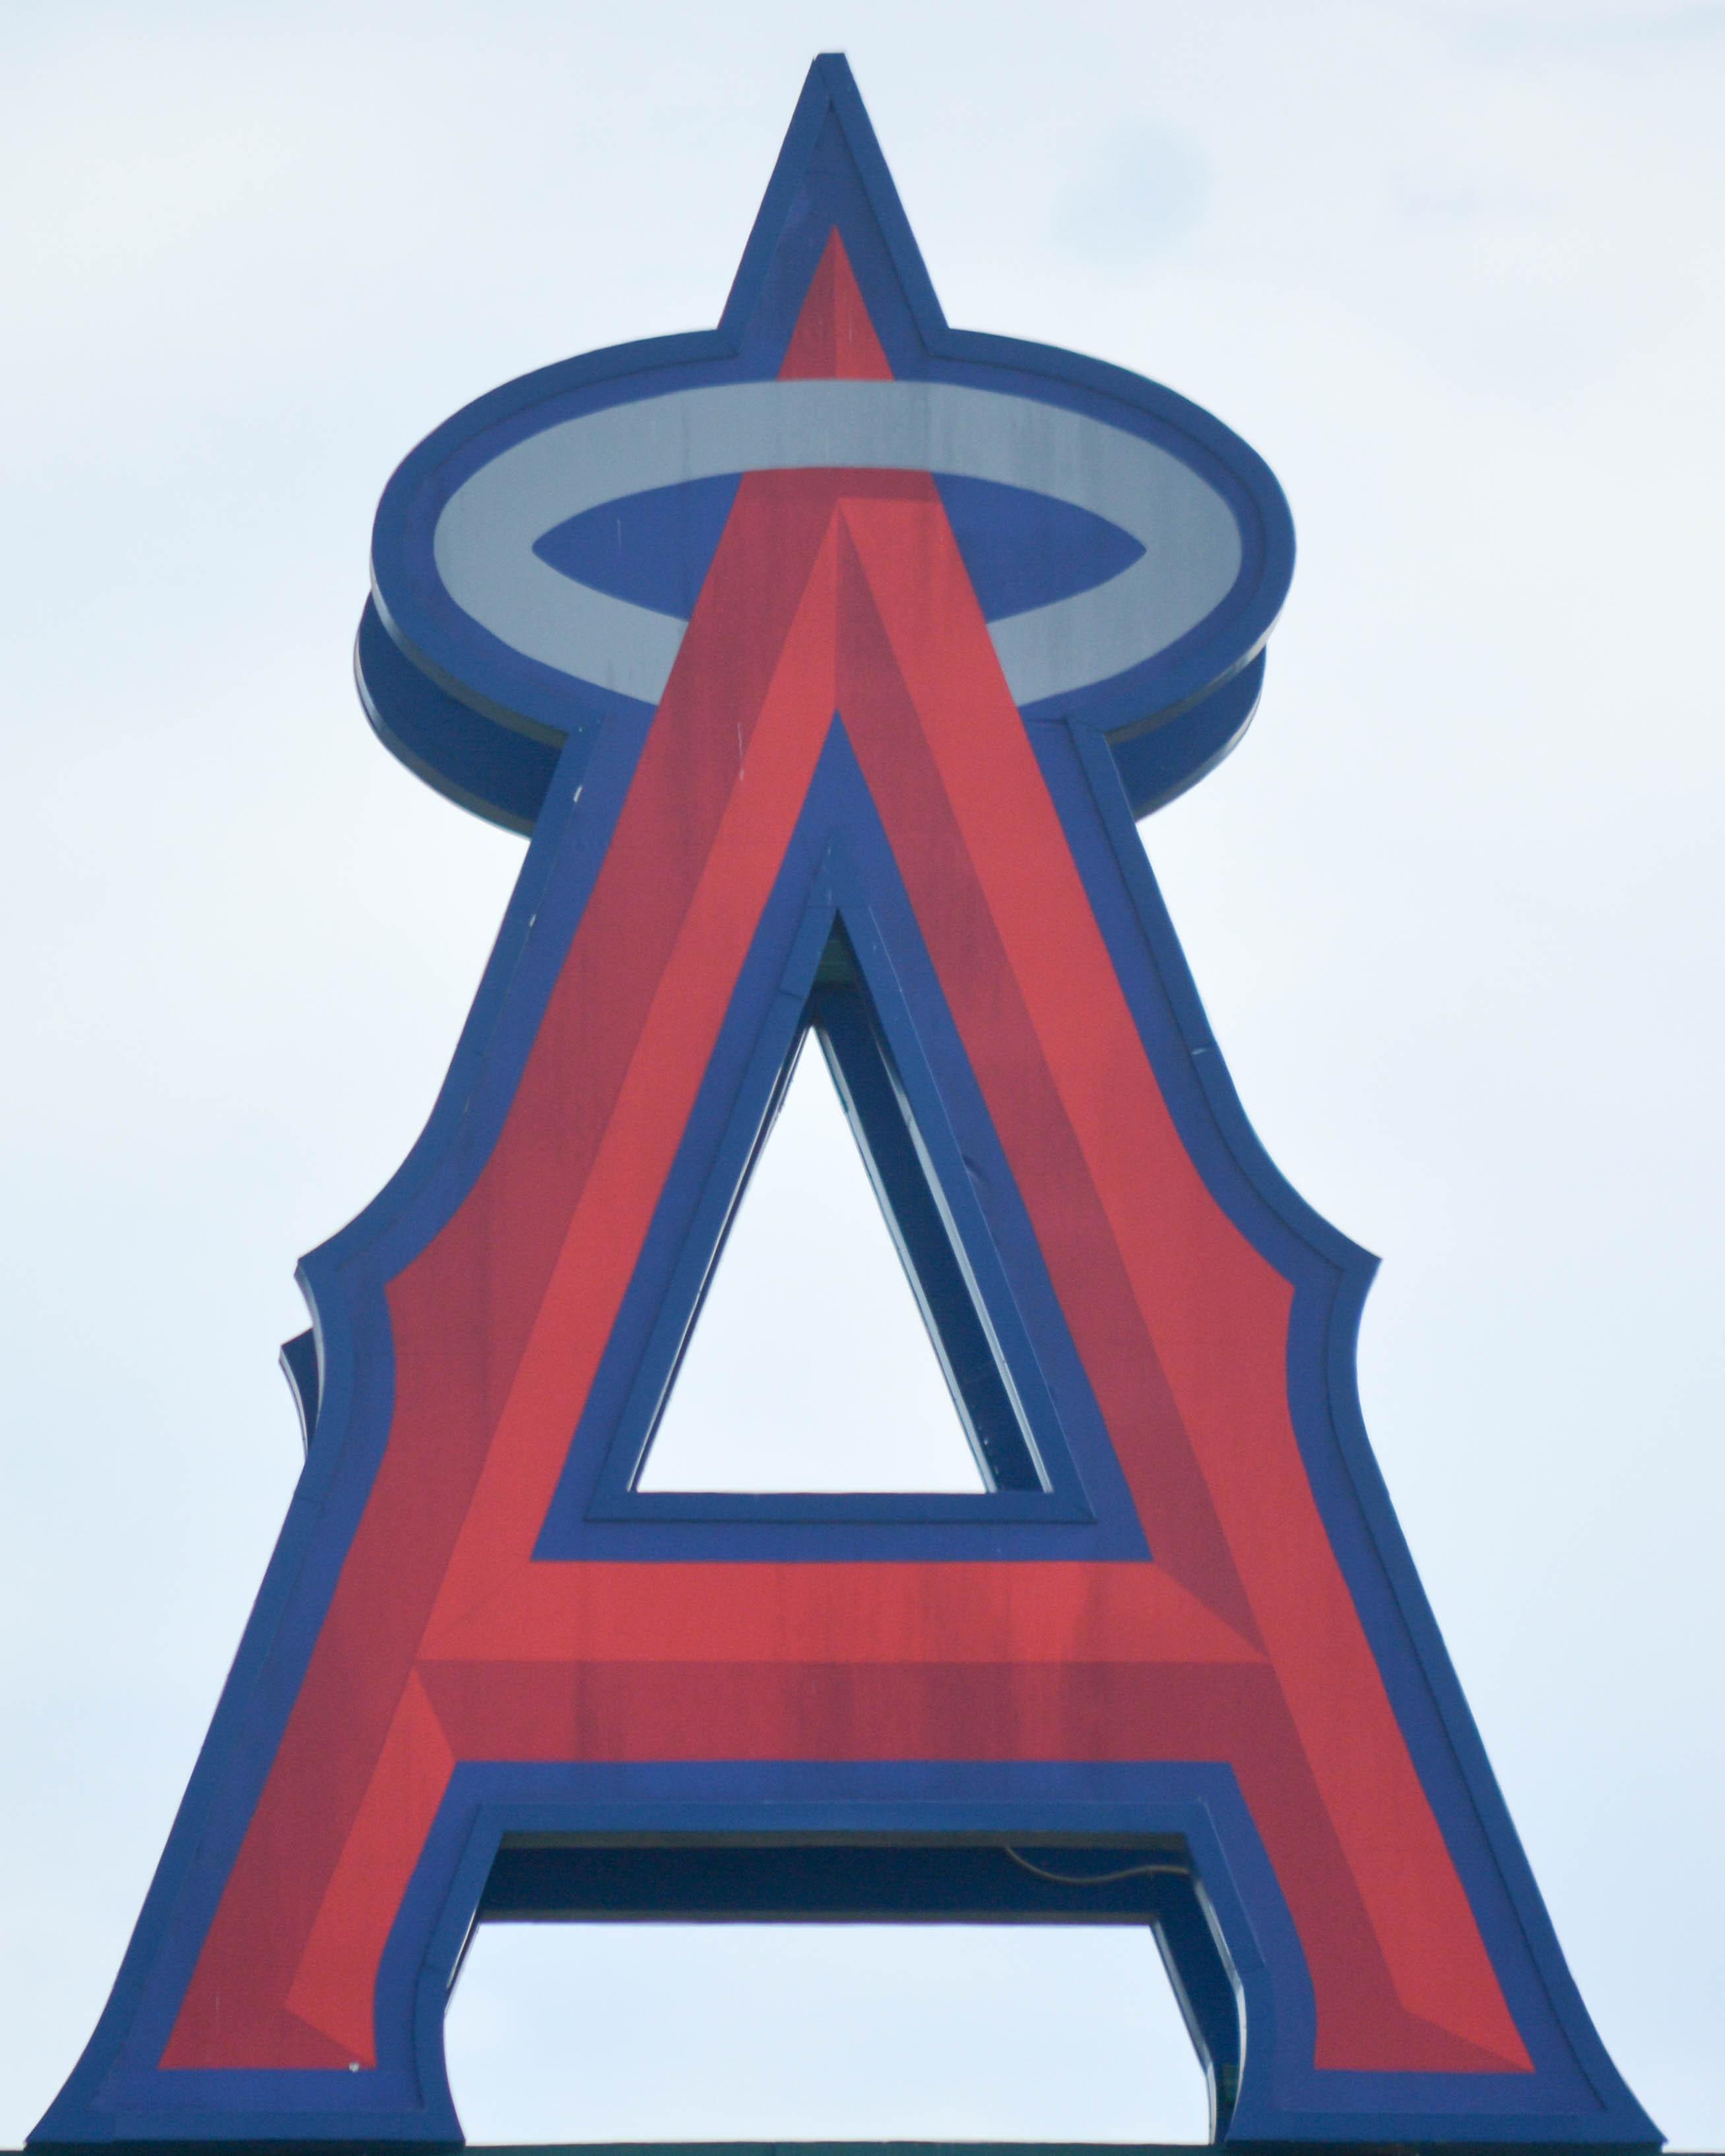 Los Angeles Angels Stadium Best Seats At Angel Stadium Of Anaheim